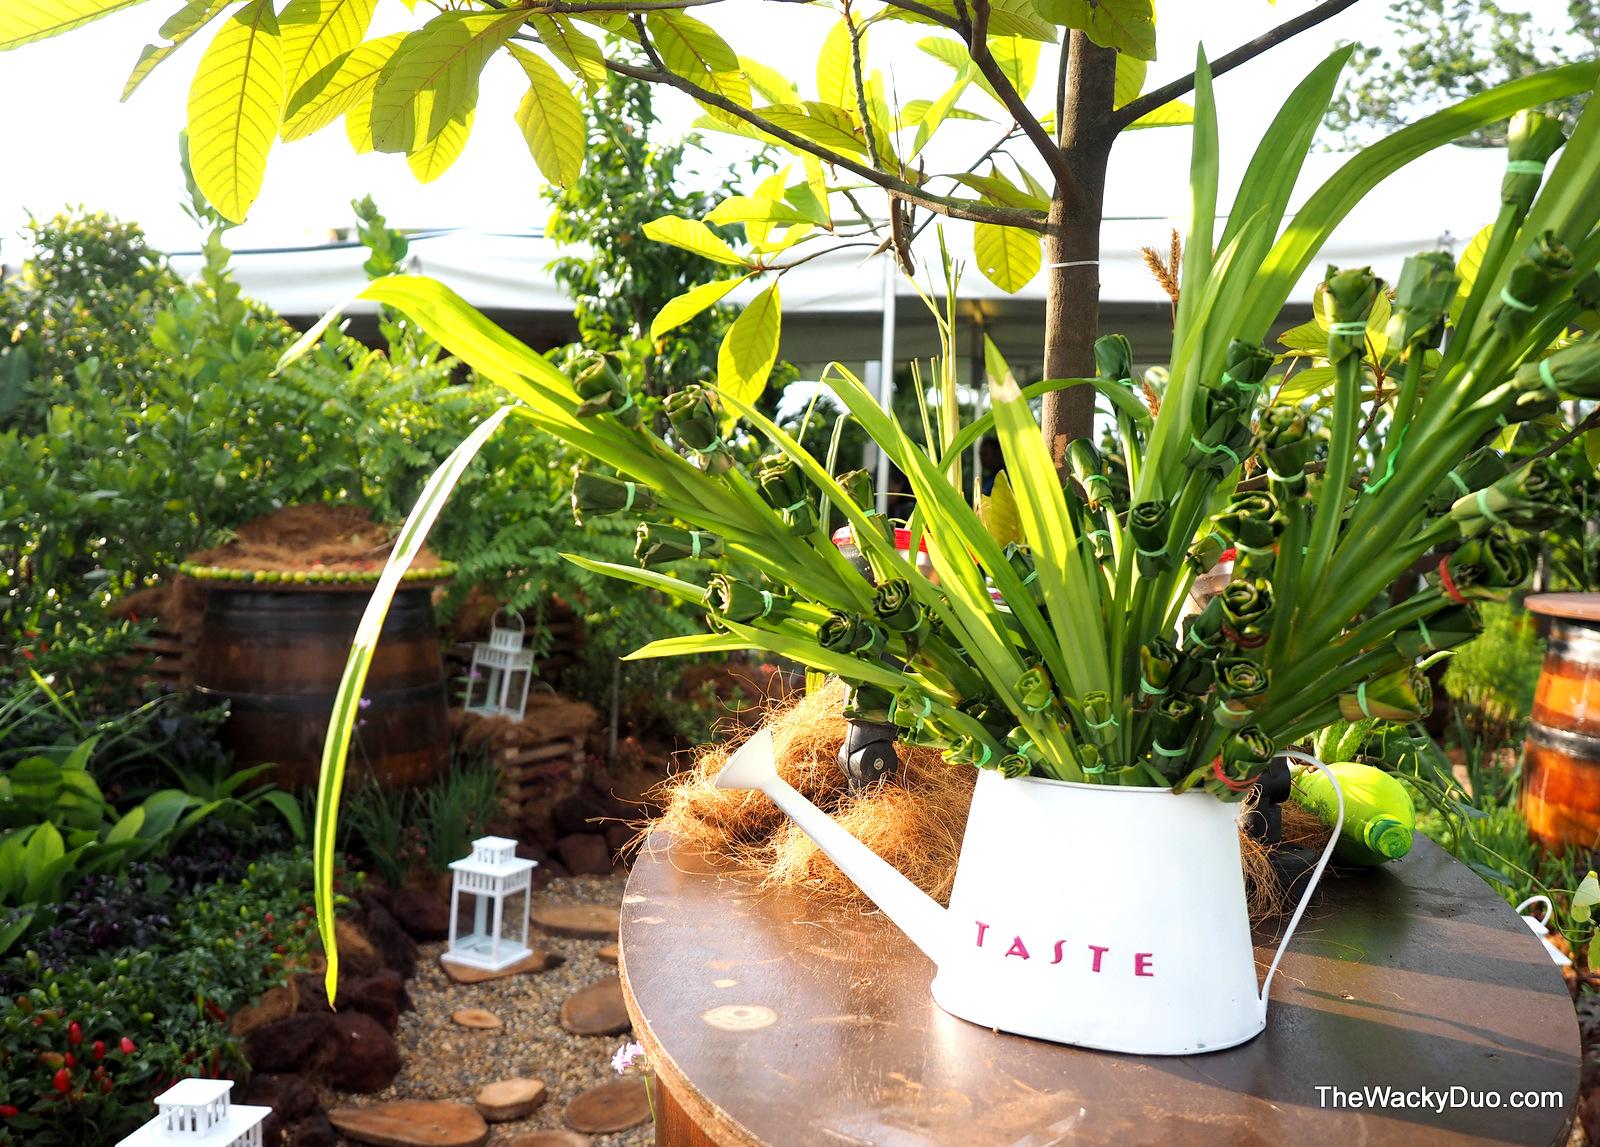 Singapore garden festival in full bloom the wacky duo for Indoor gardening expo 2014